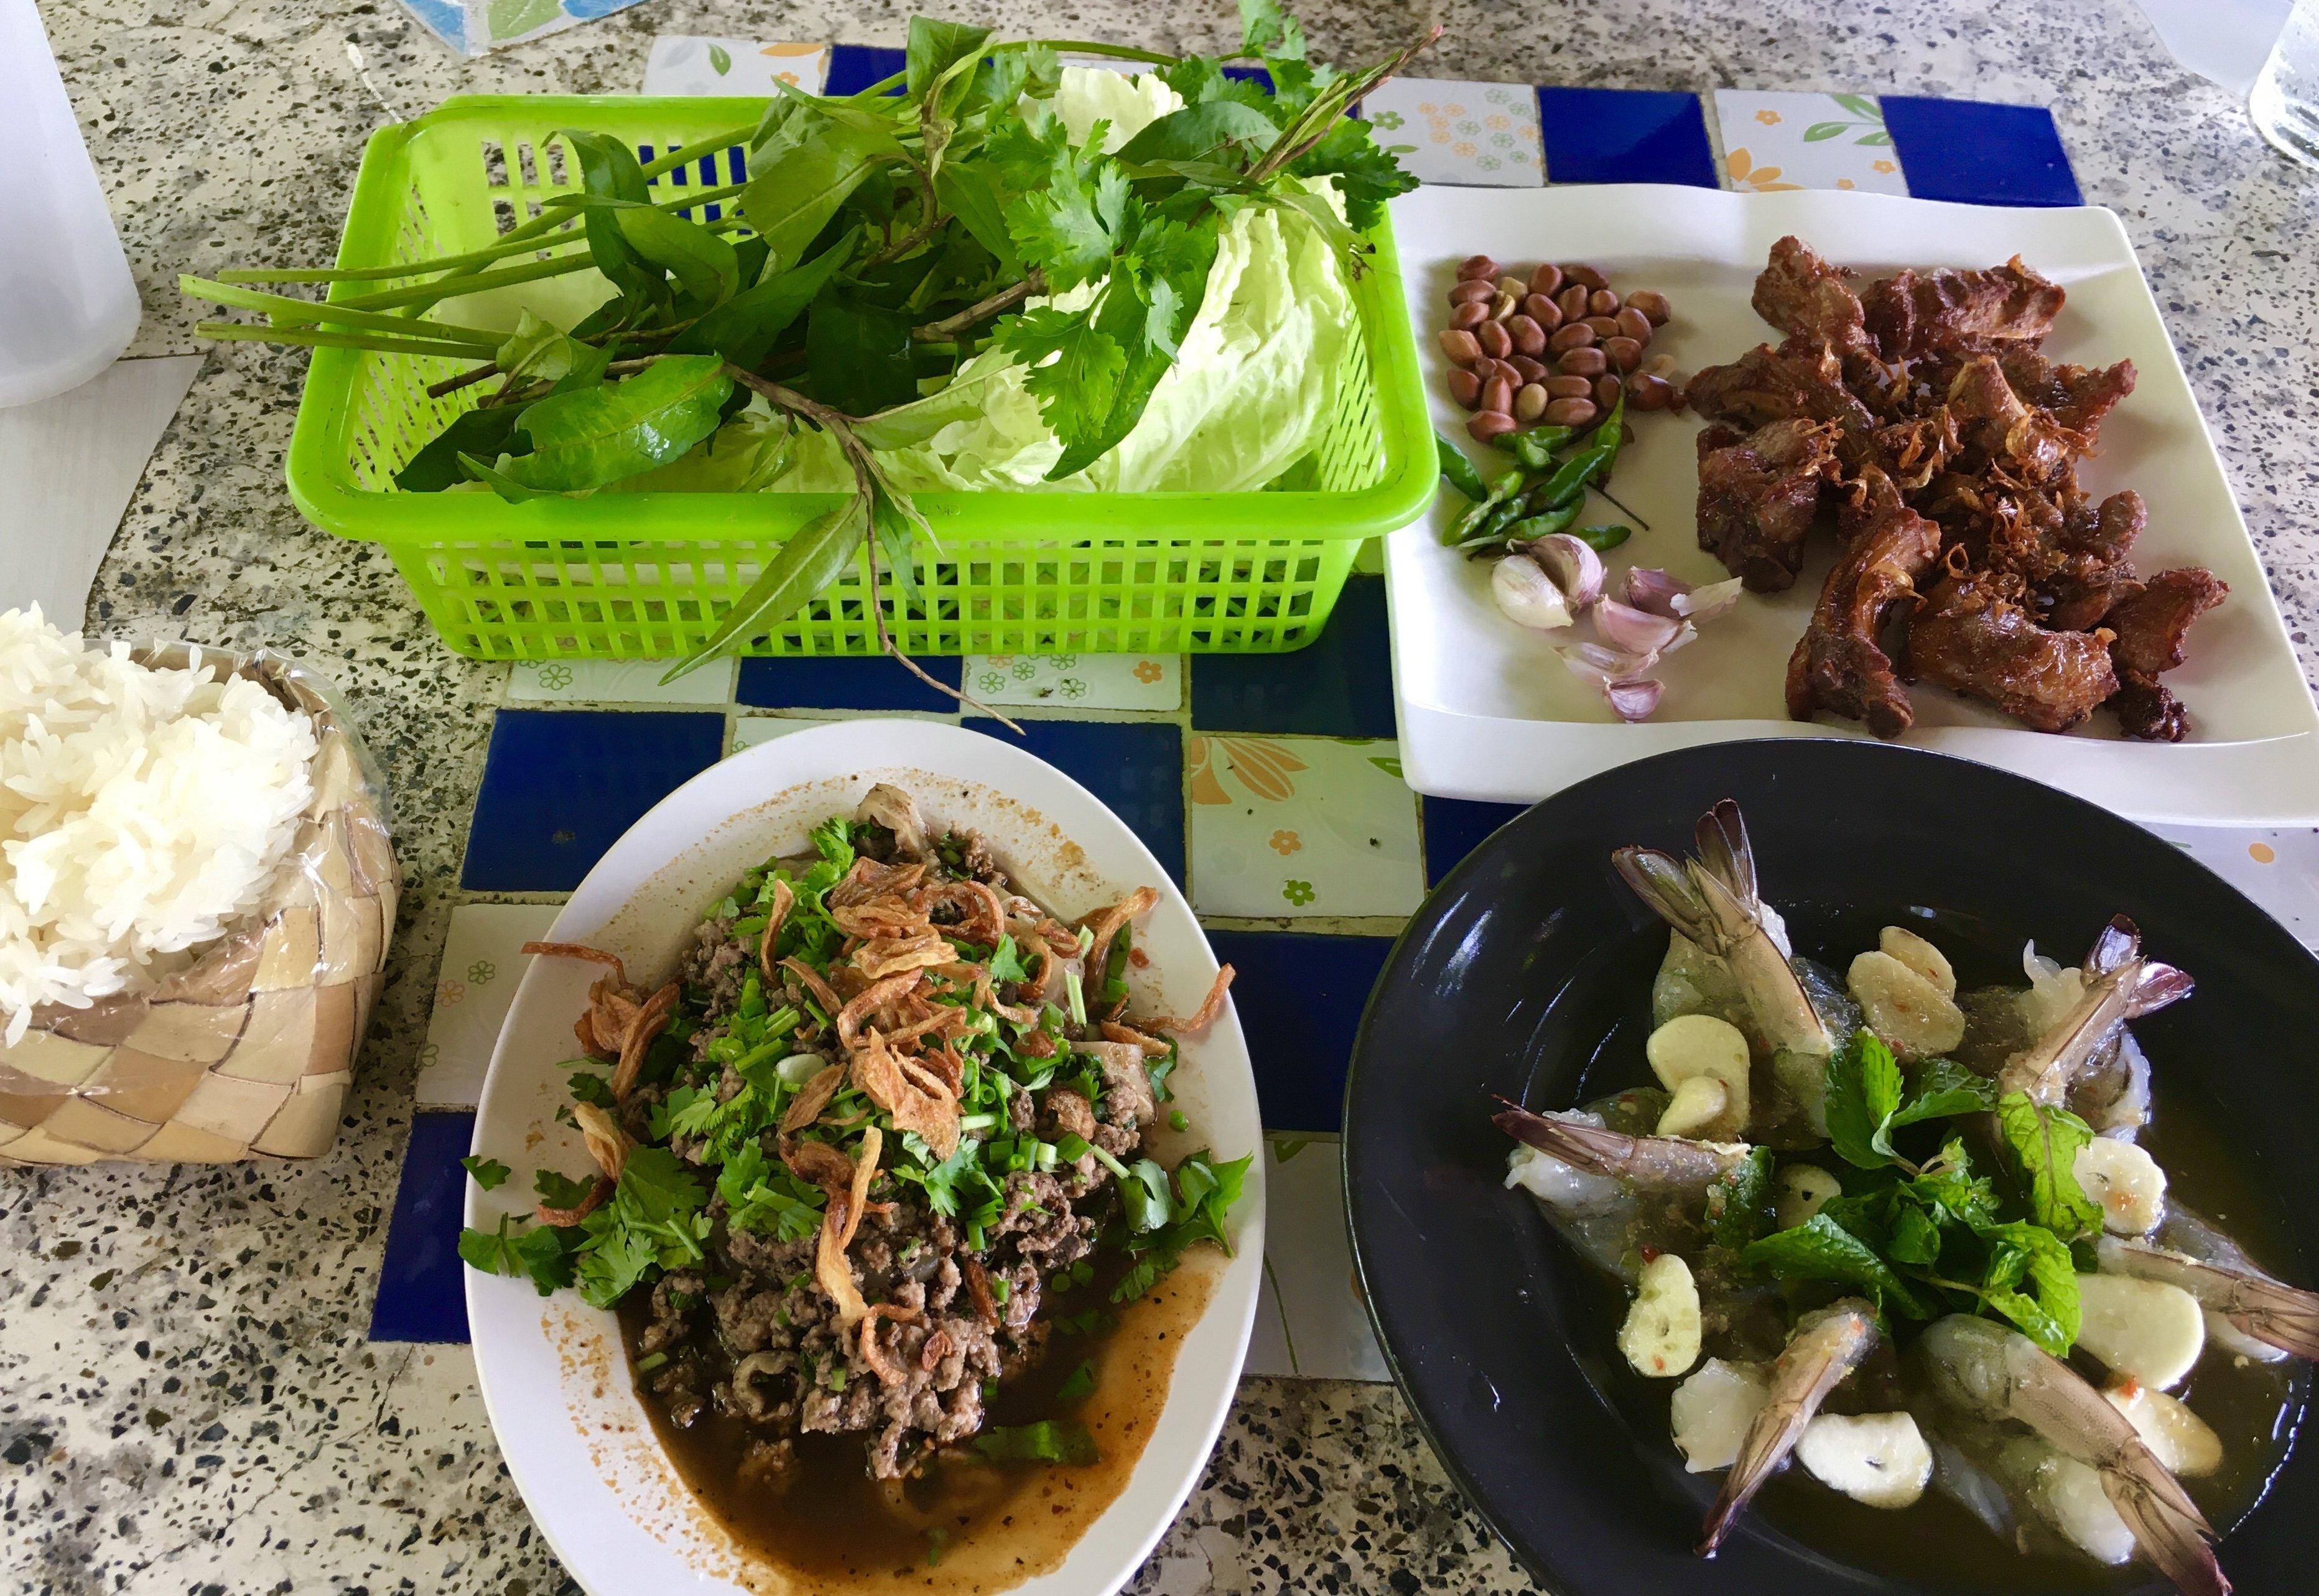 Pork laab, sour ribs, and raw shrimp with garlic at Laab Rim Na Restaurant - Pa Pong, Doi Saket